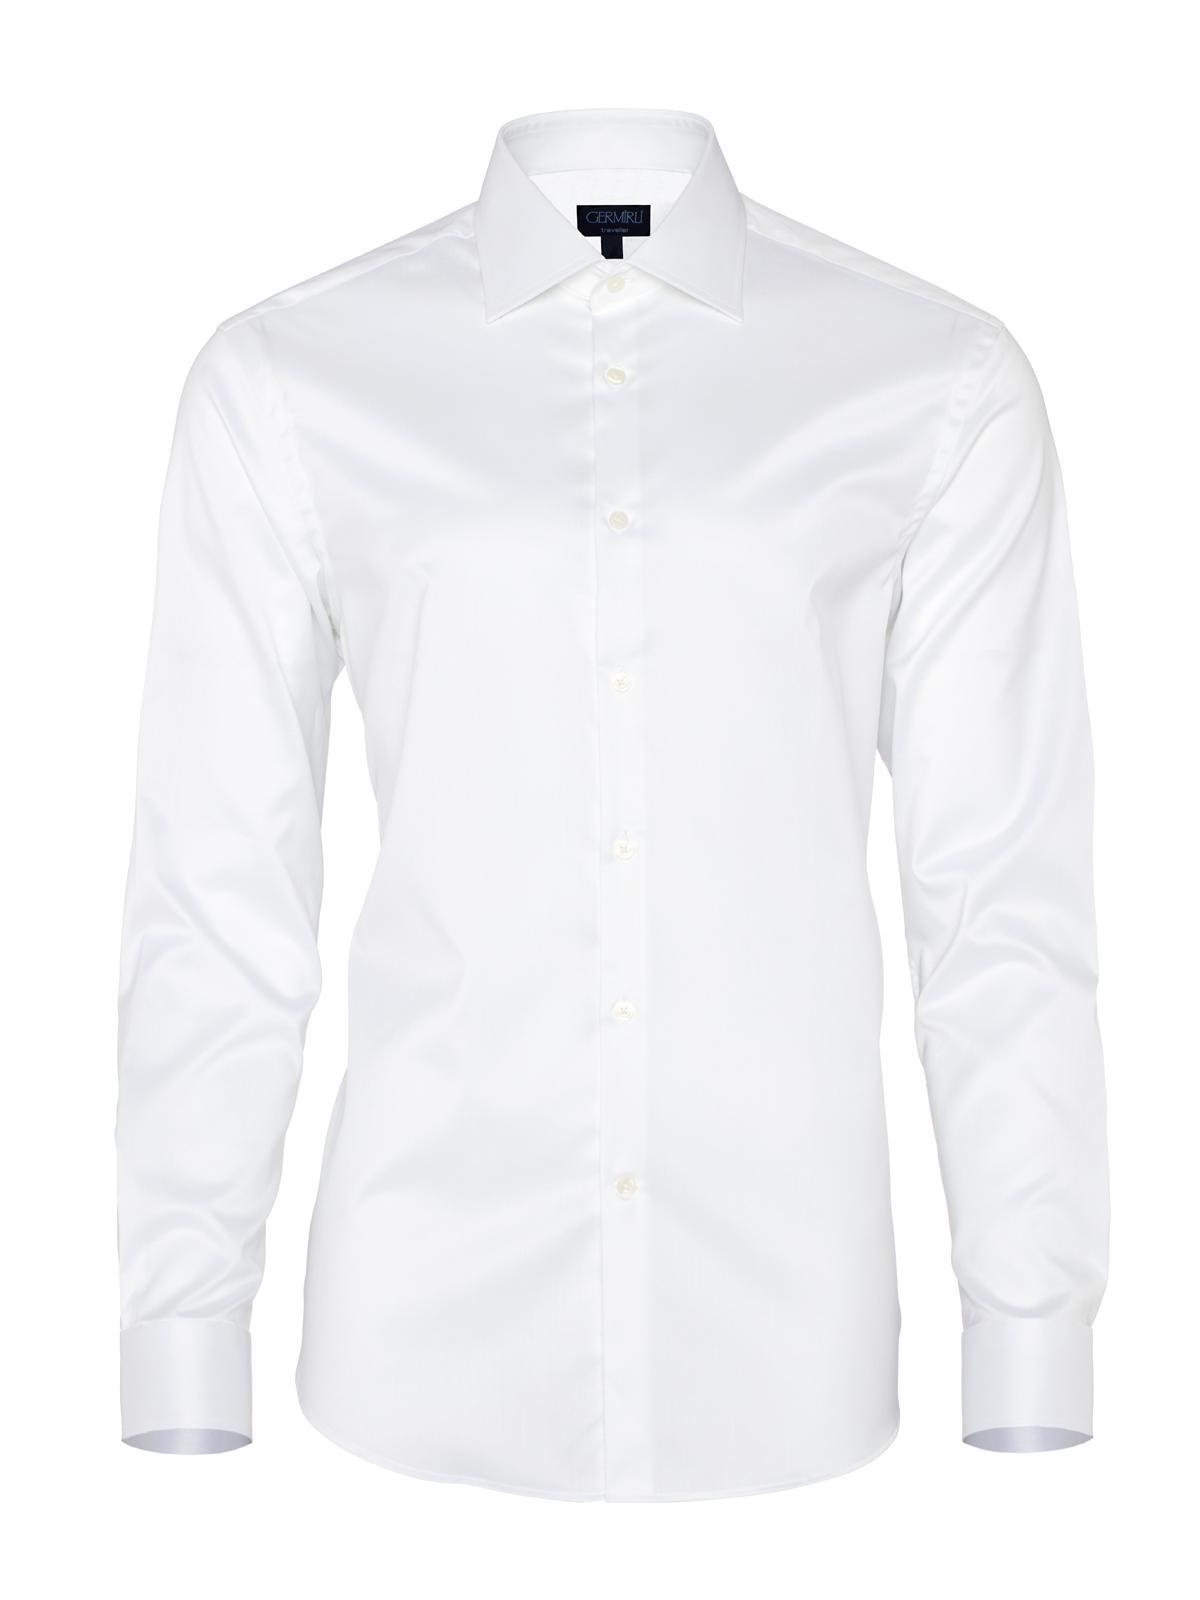 Germirli Non Iron Beyaz Twill Tailor Fit Gömlek